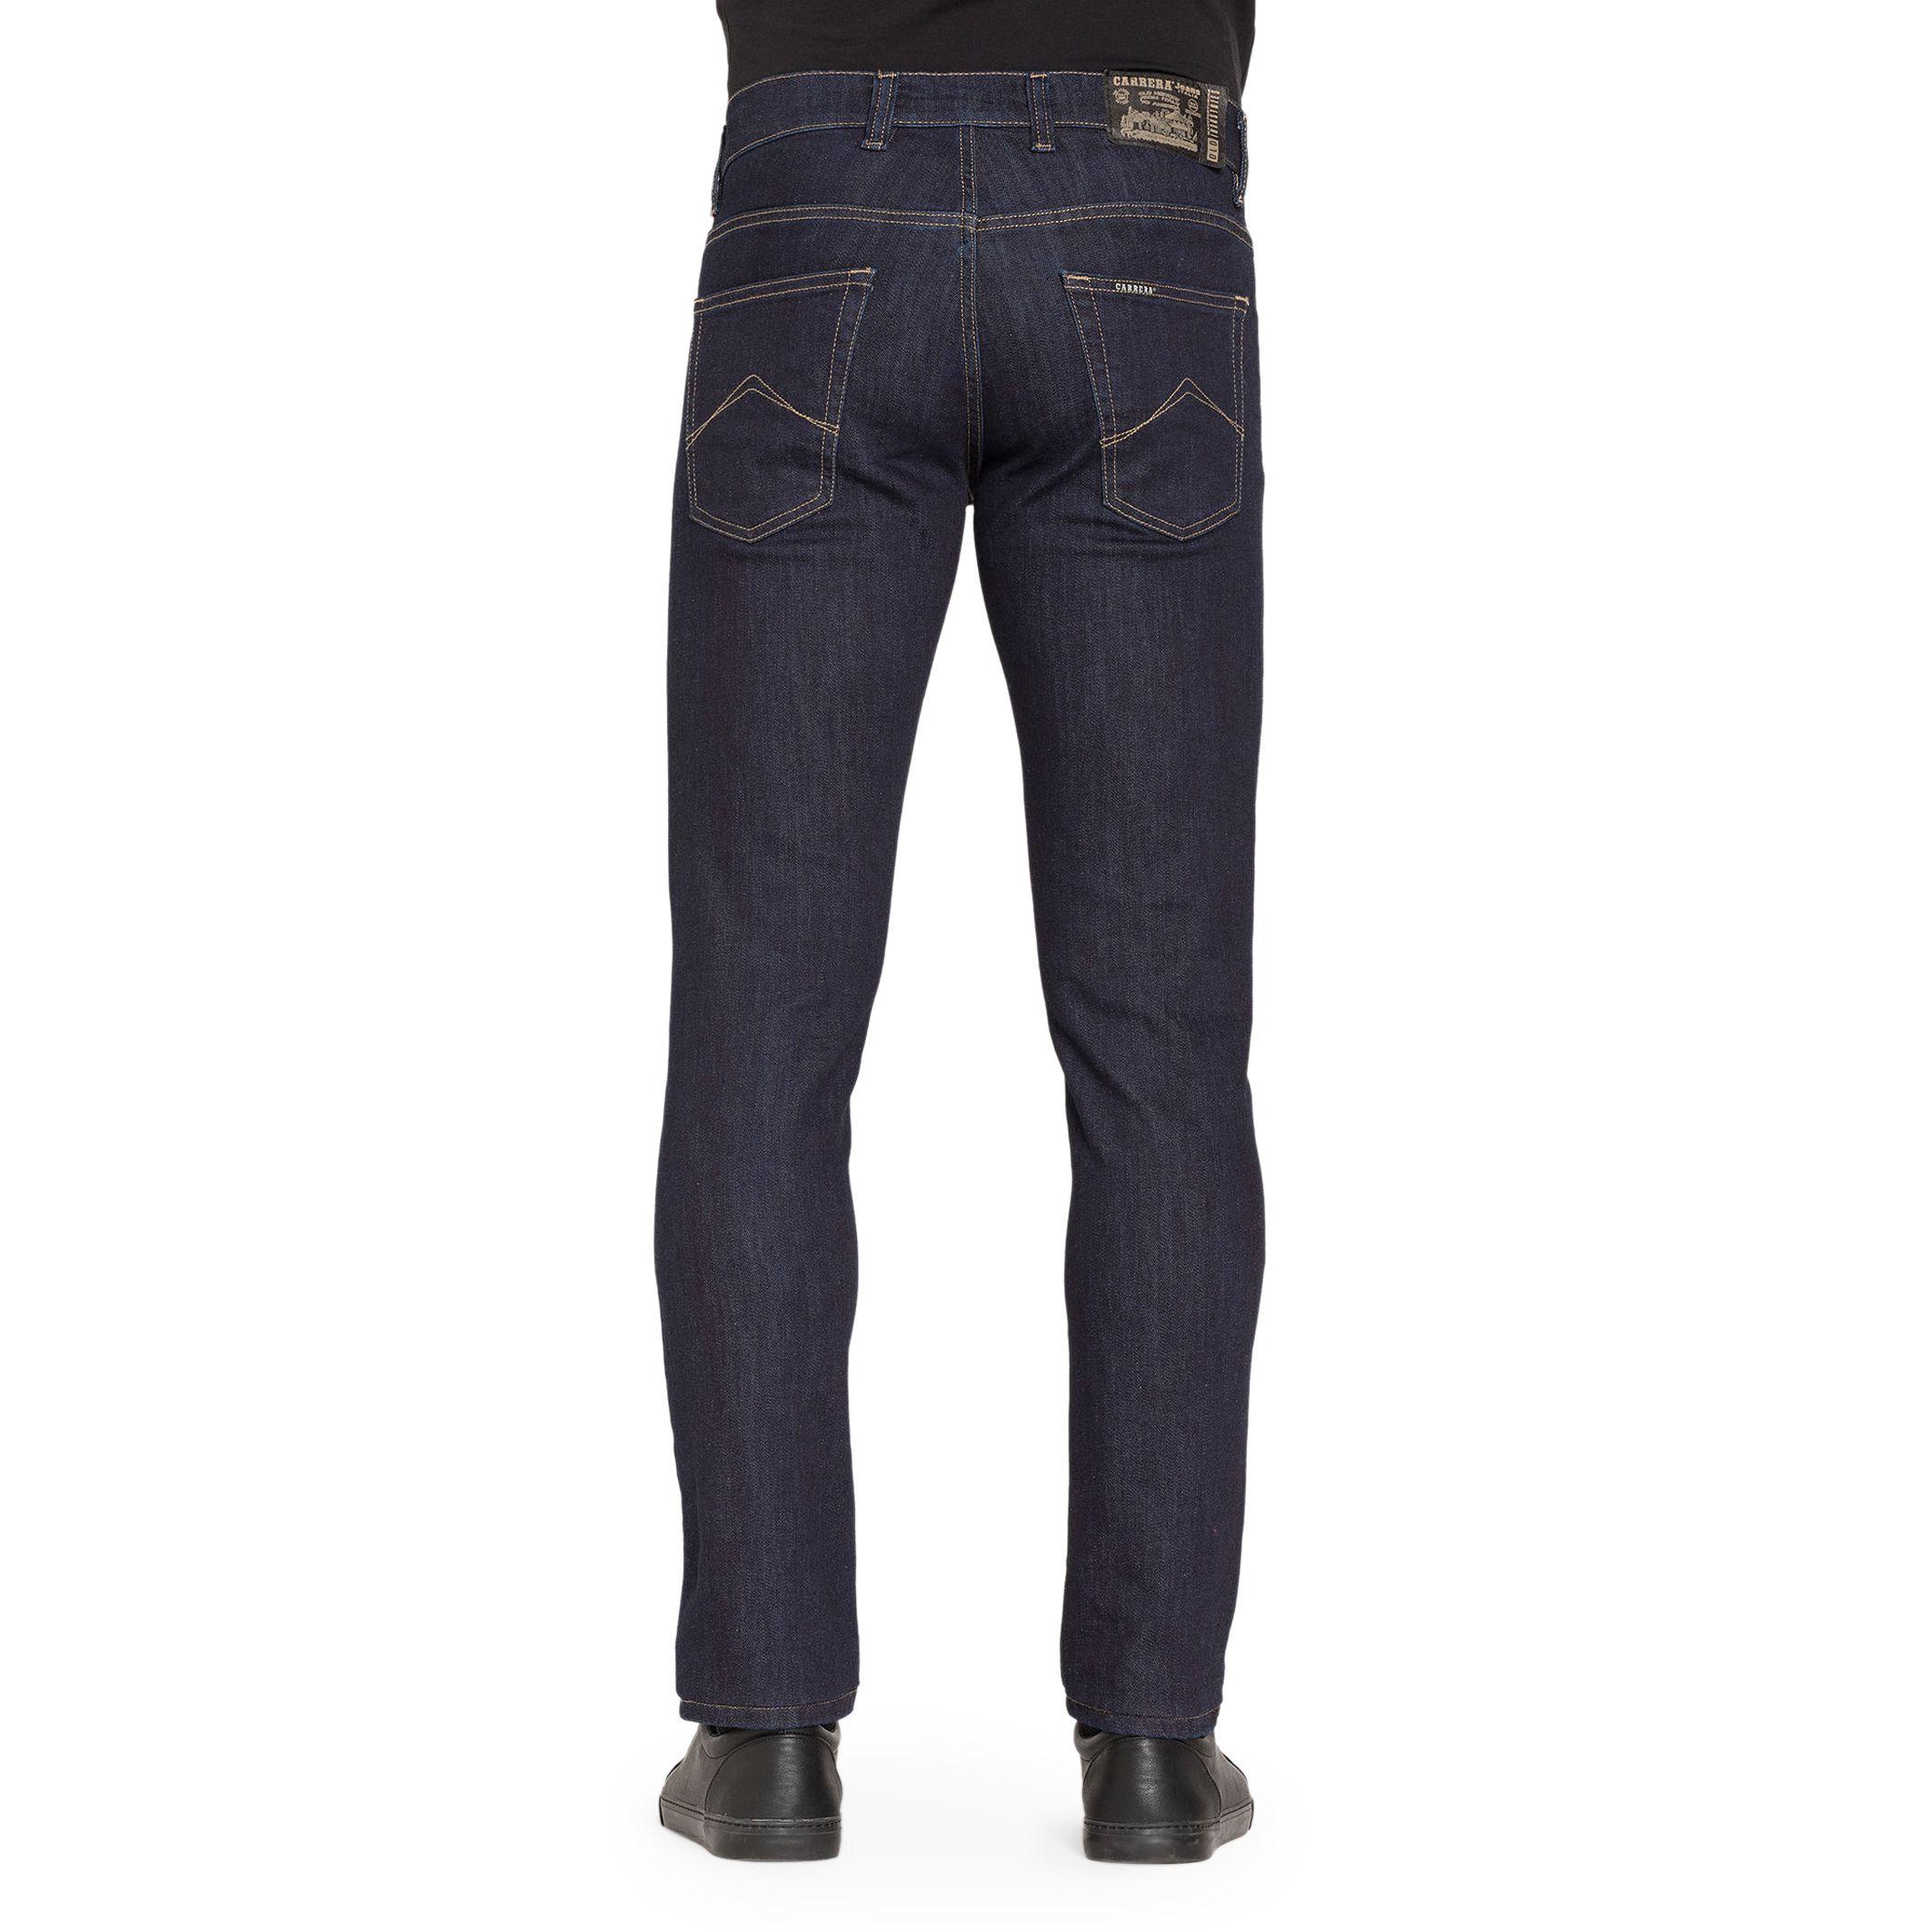 Carrera Jeans – 717_0970A